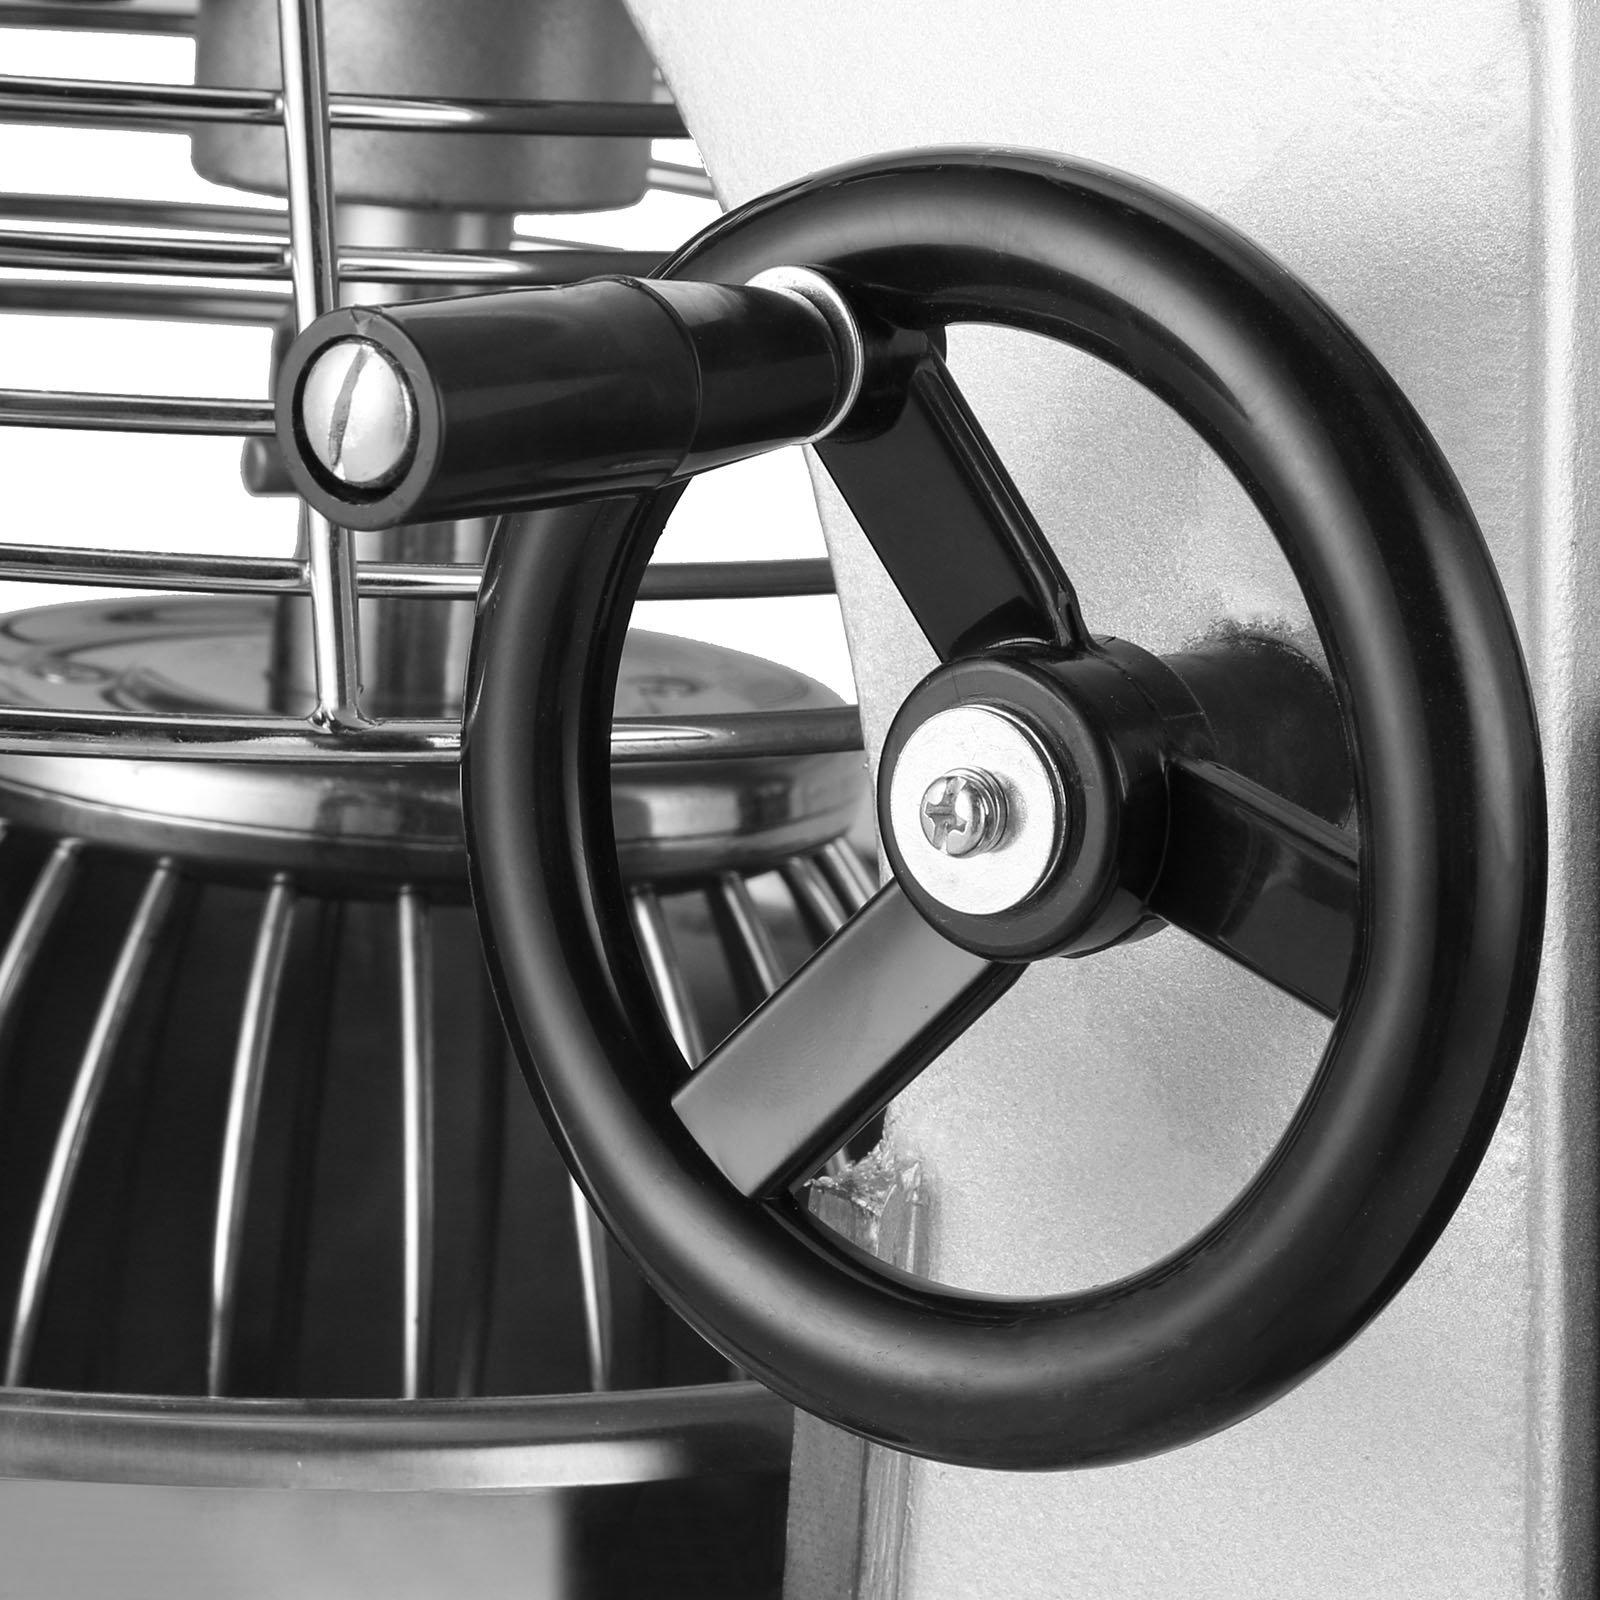 Happybuy Commercial Food Mixer 750W Dough Mixer Maker 3 Speeds Adjustable Commercial Mixer Grinder 94/165/386 RPM Stand Mixer (20 qt) by Happybuy (Image #7)